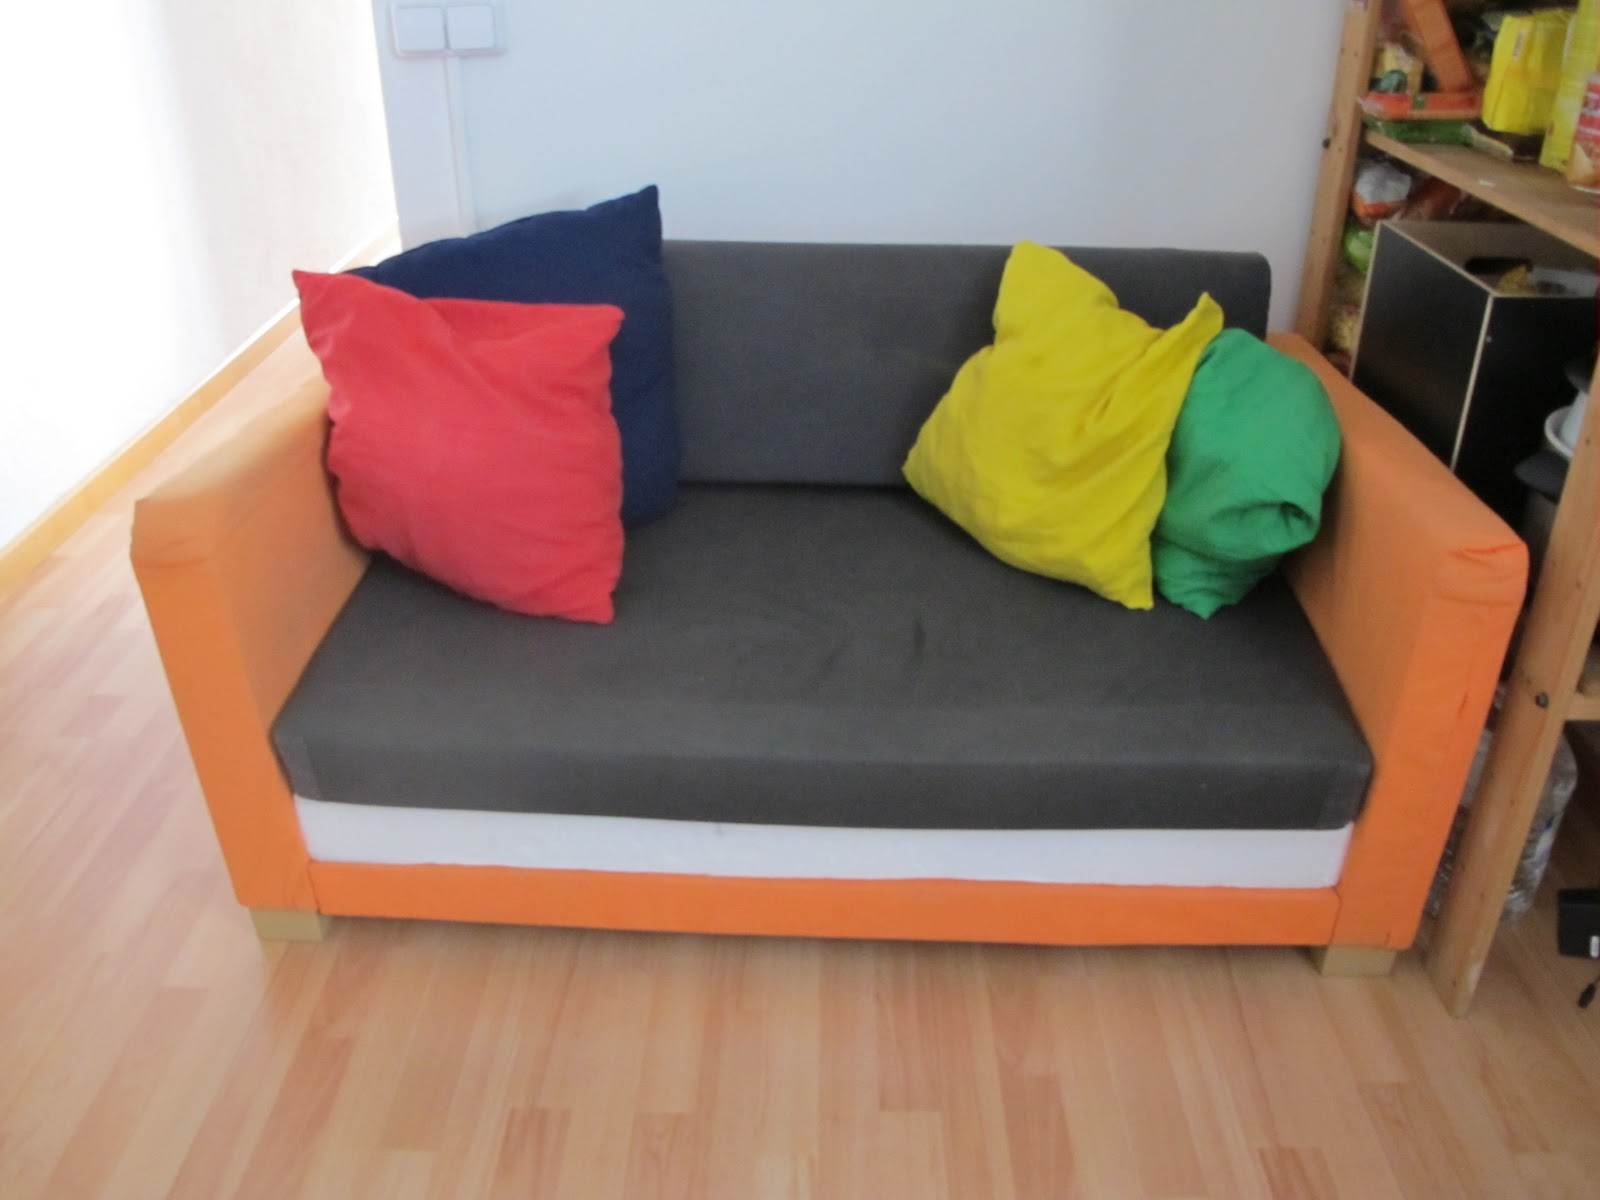 muebles cama ikea segunda mano sof cama plazas tullinge marrn grisceo ikea